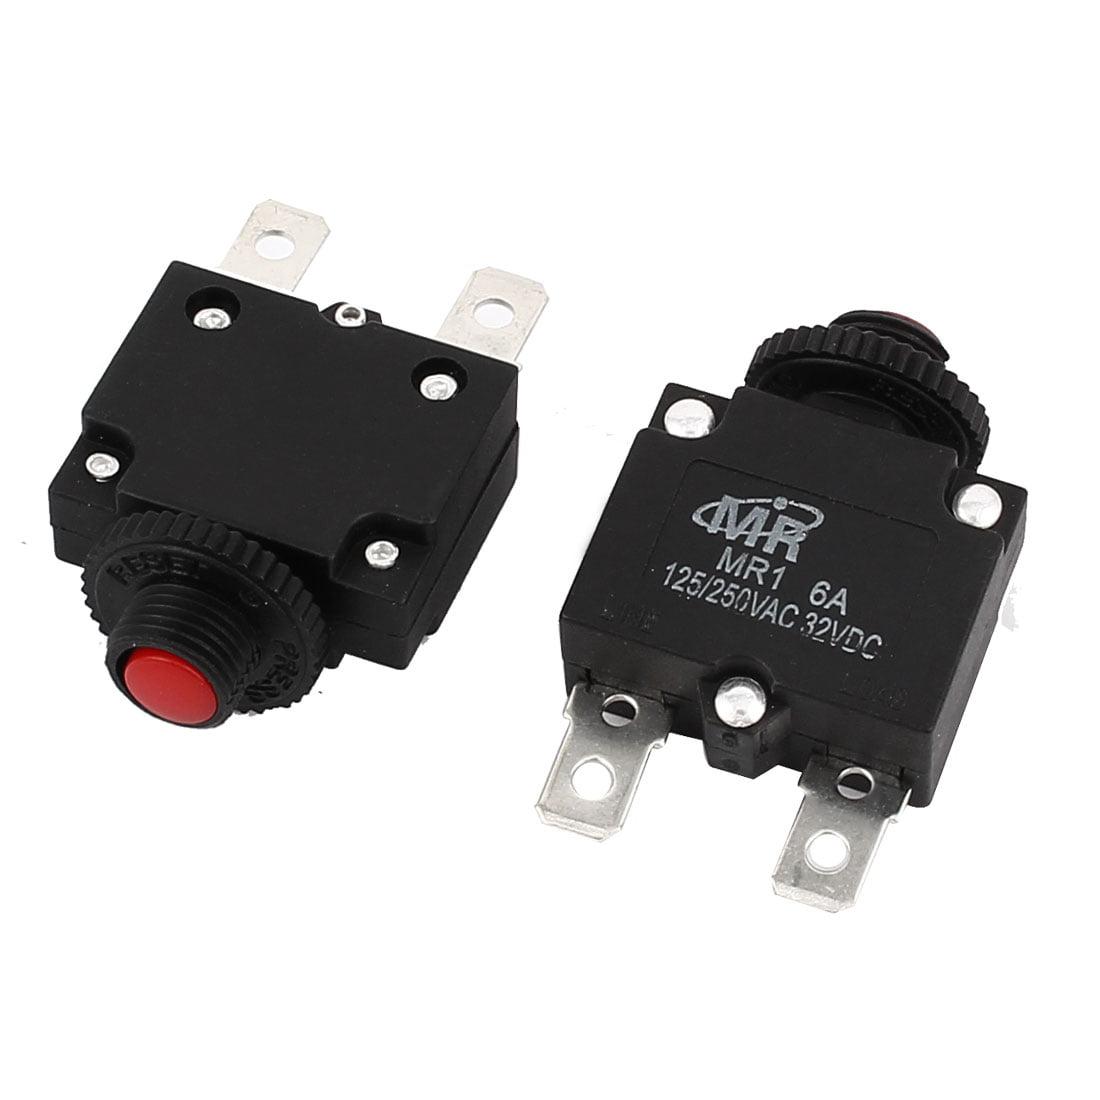 Unique Bargains  125V/250V 6A Red Reset Button Overload Protector Circuit Breaker 2Pcs